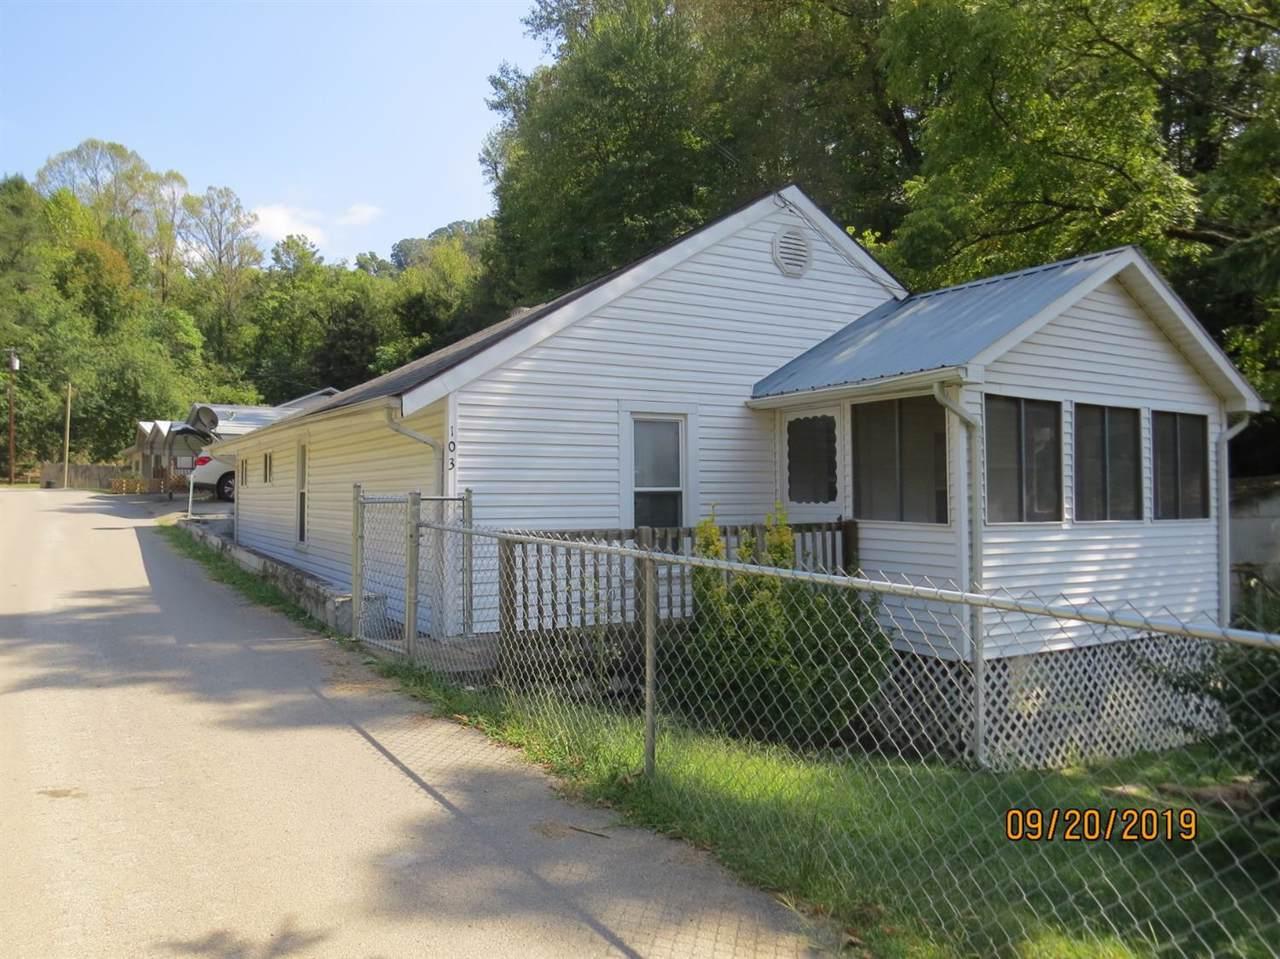 103 Carter Ave - Photo 1